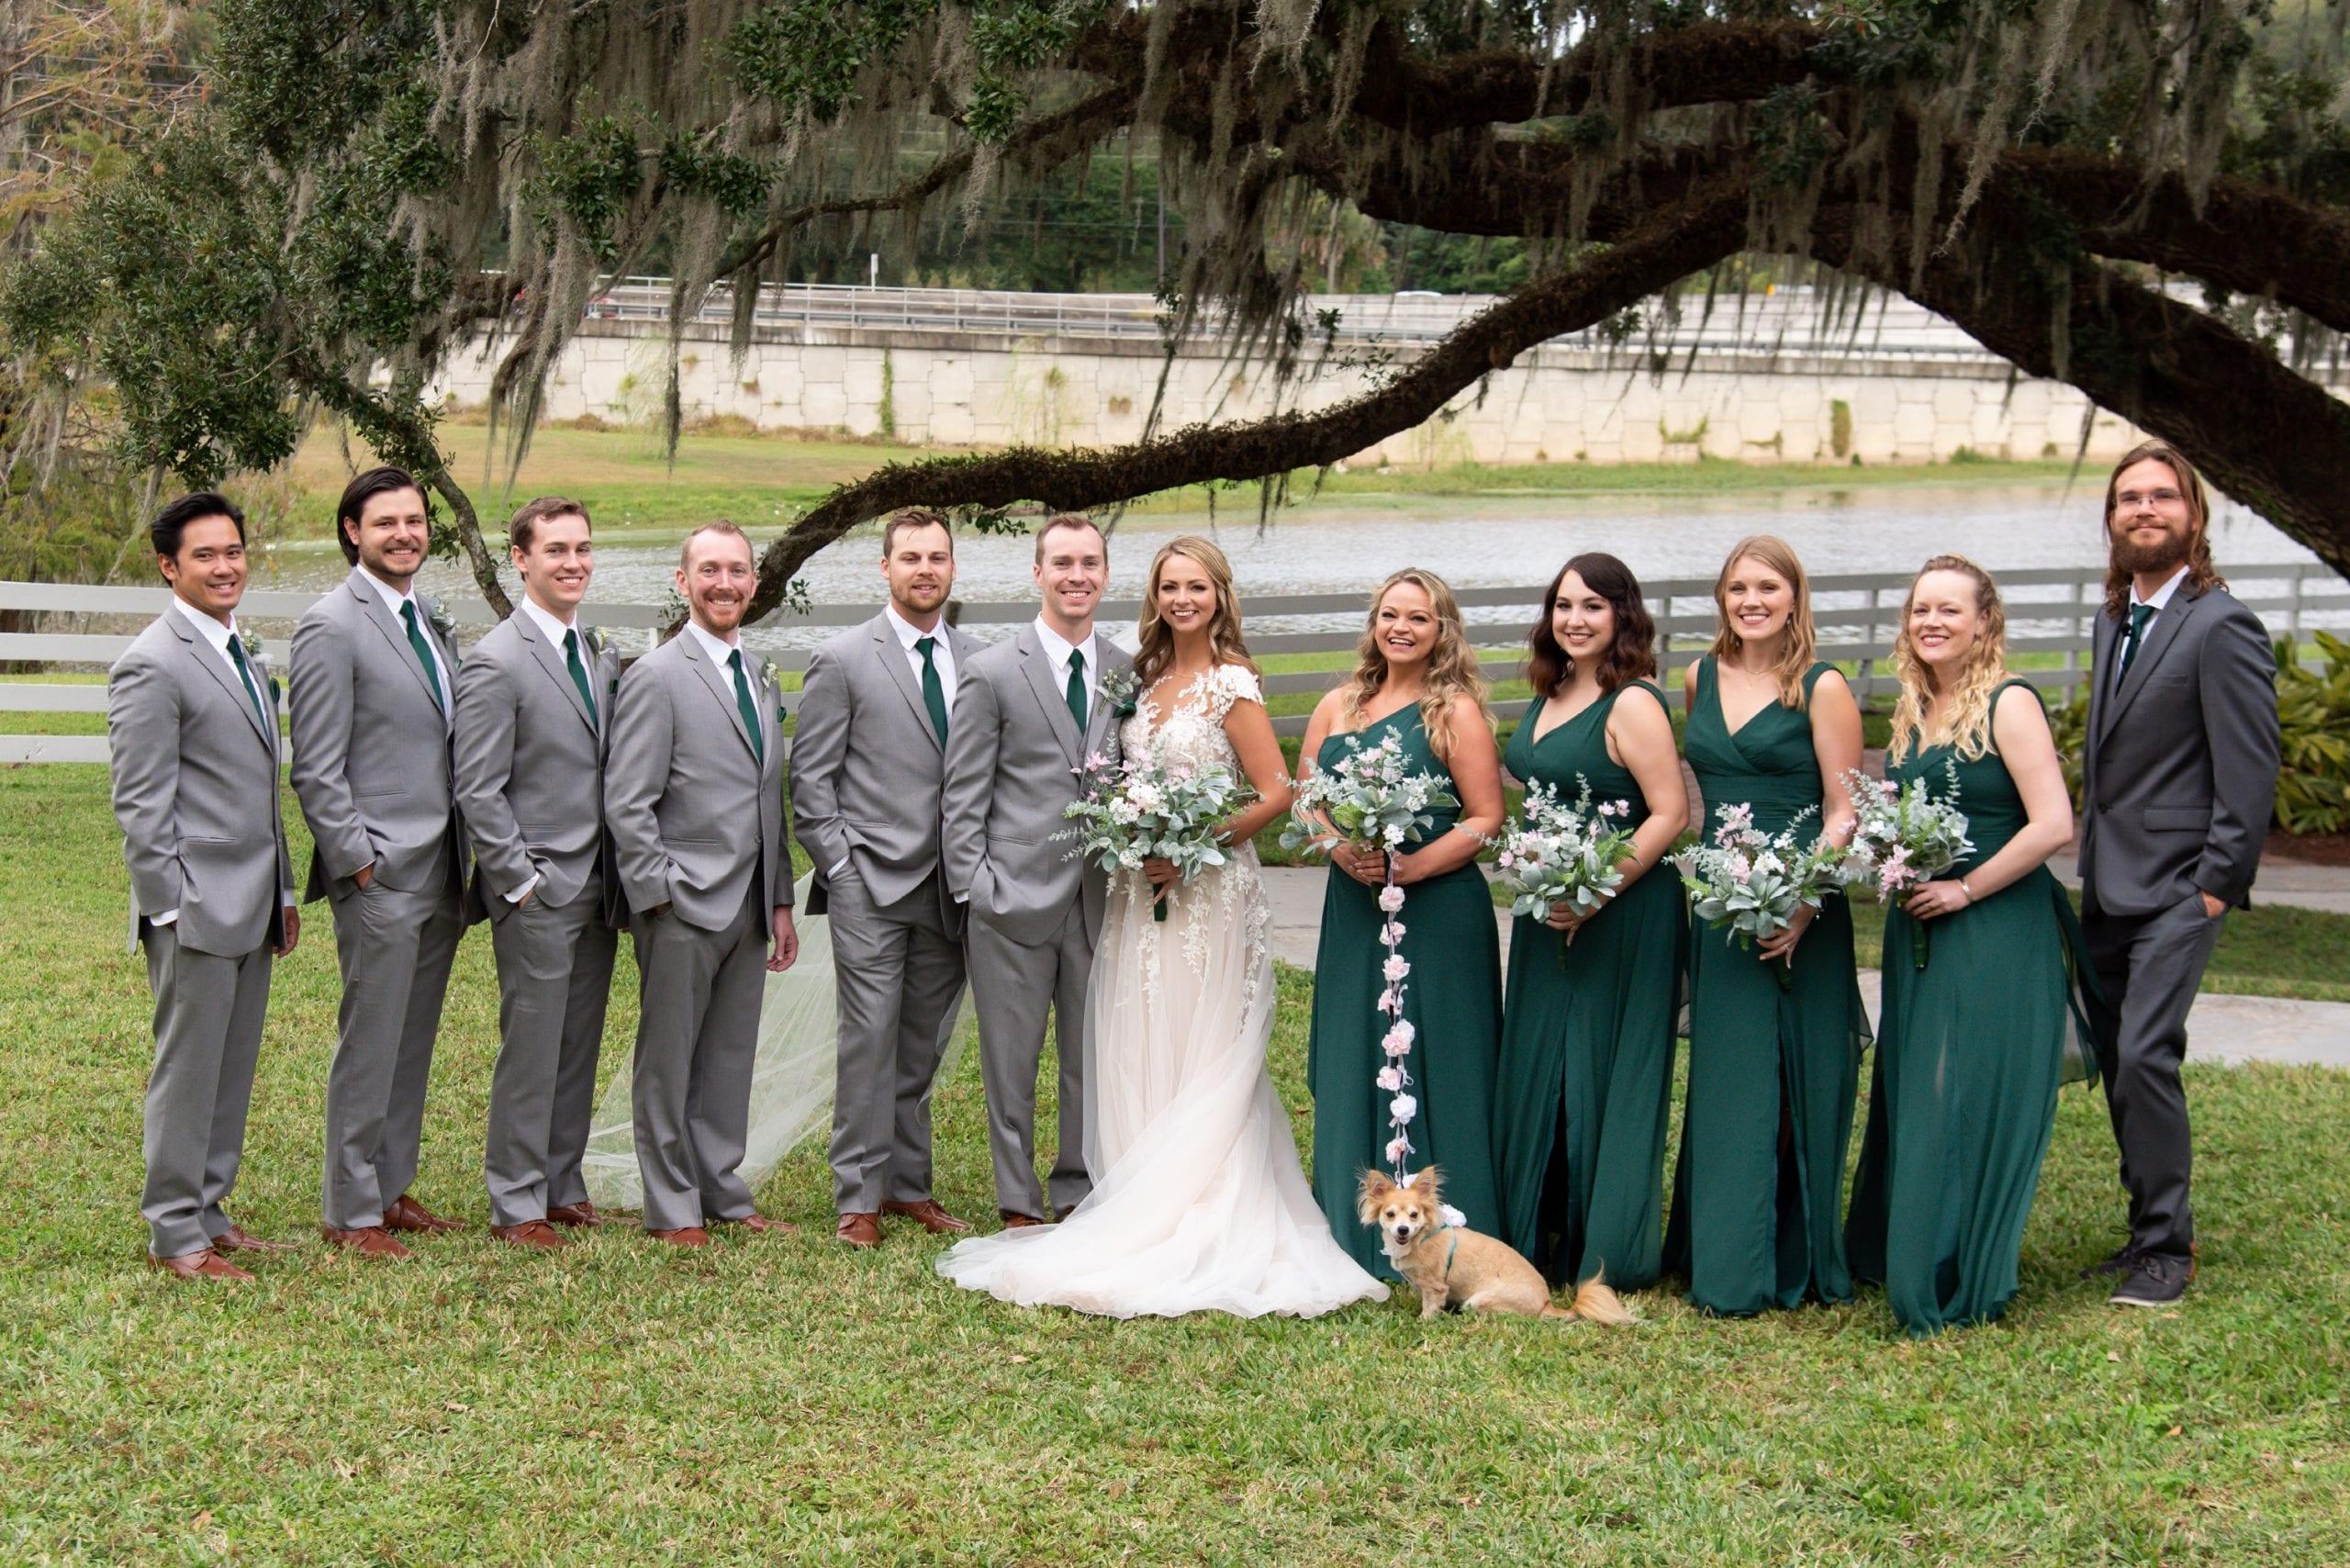 Winter wedding in Apopka Florida